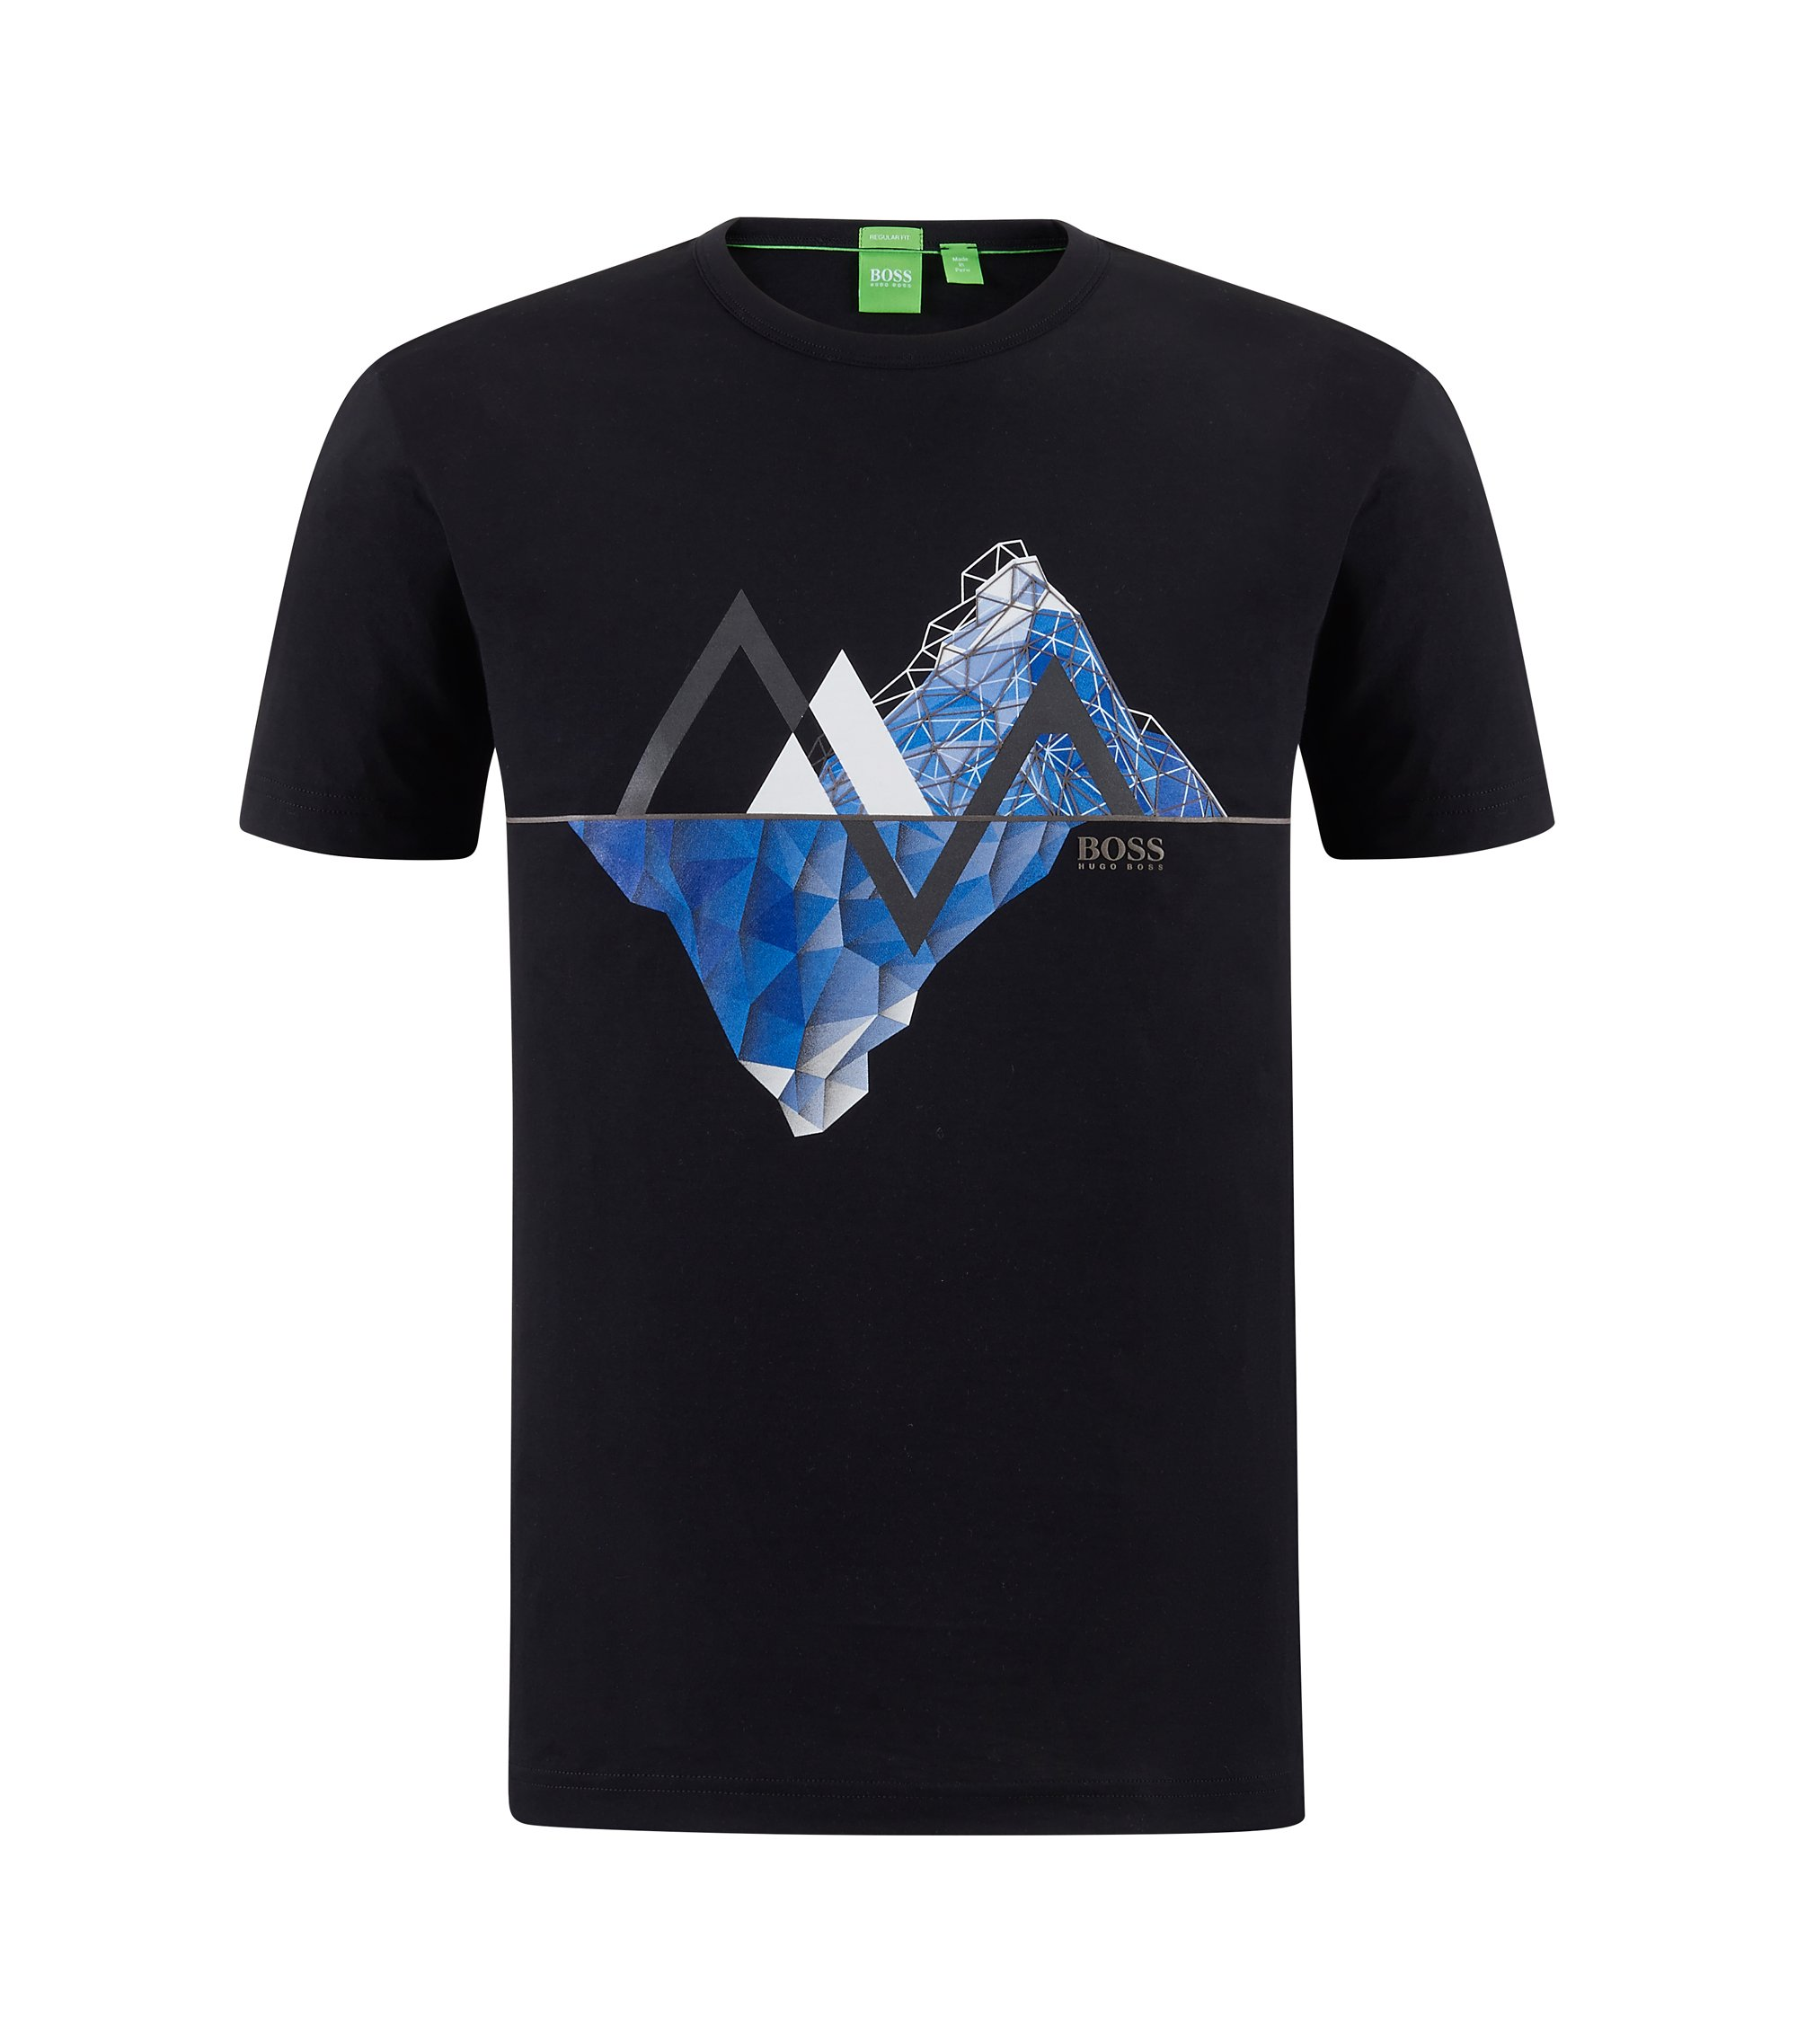 Cotton Graphic T-Shirt | Tee, White